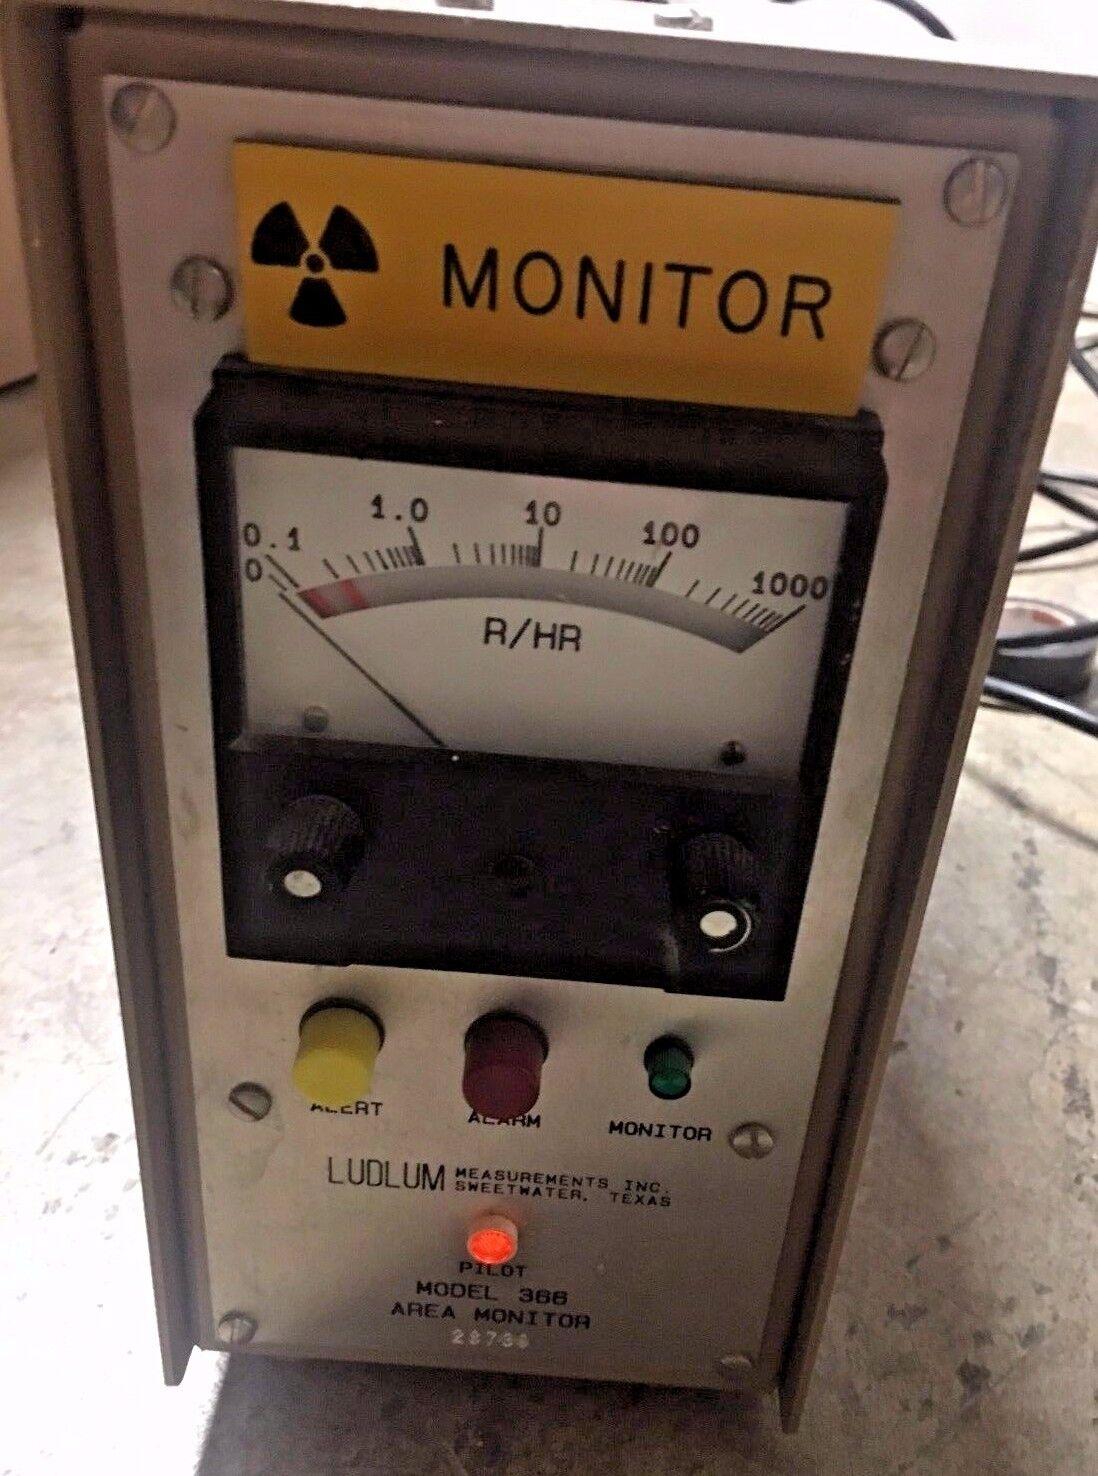 s l1600 - LudLum Measurements Model 366 Geiger Counter No Probe roentgen rad No power cord